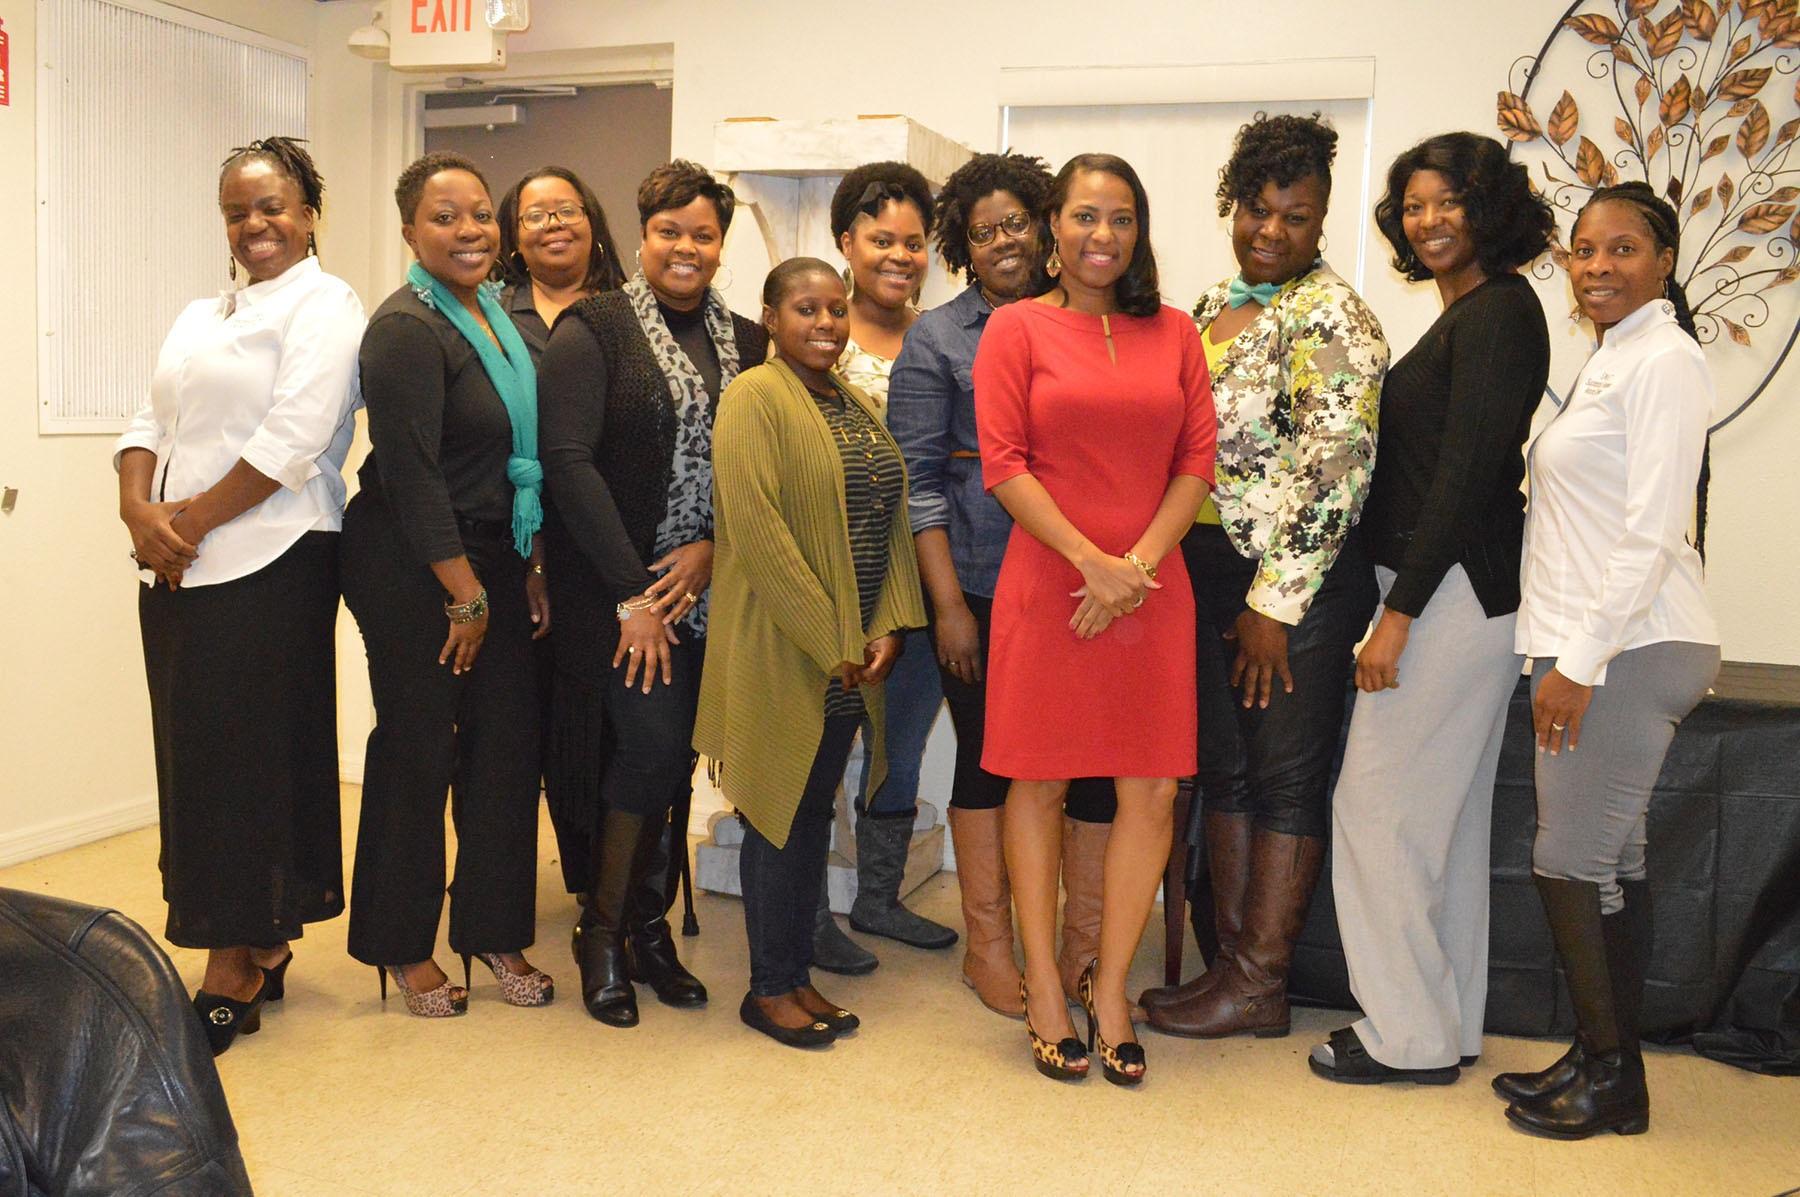 WOMEN'S ORGANIZATION HOSTS VISION BOARD WORKSHOP